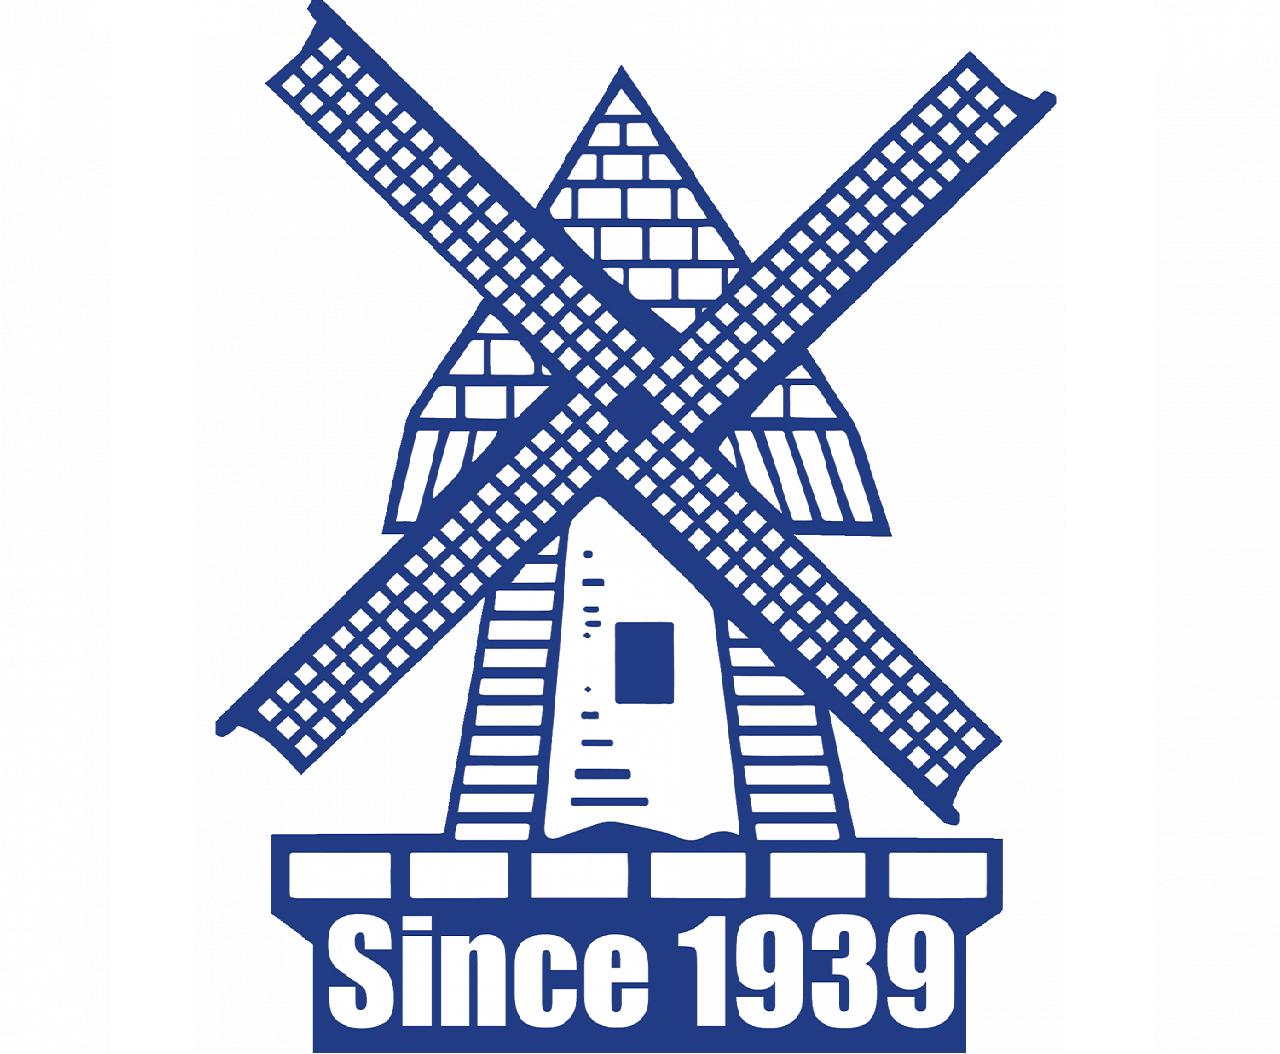 6 6l duramax gm 6 6l duramax price 600 00 [ 1280 x 956 Pixel ]